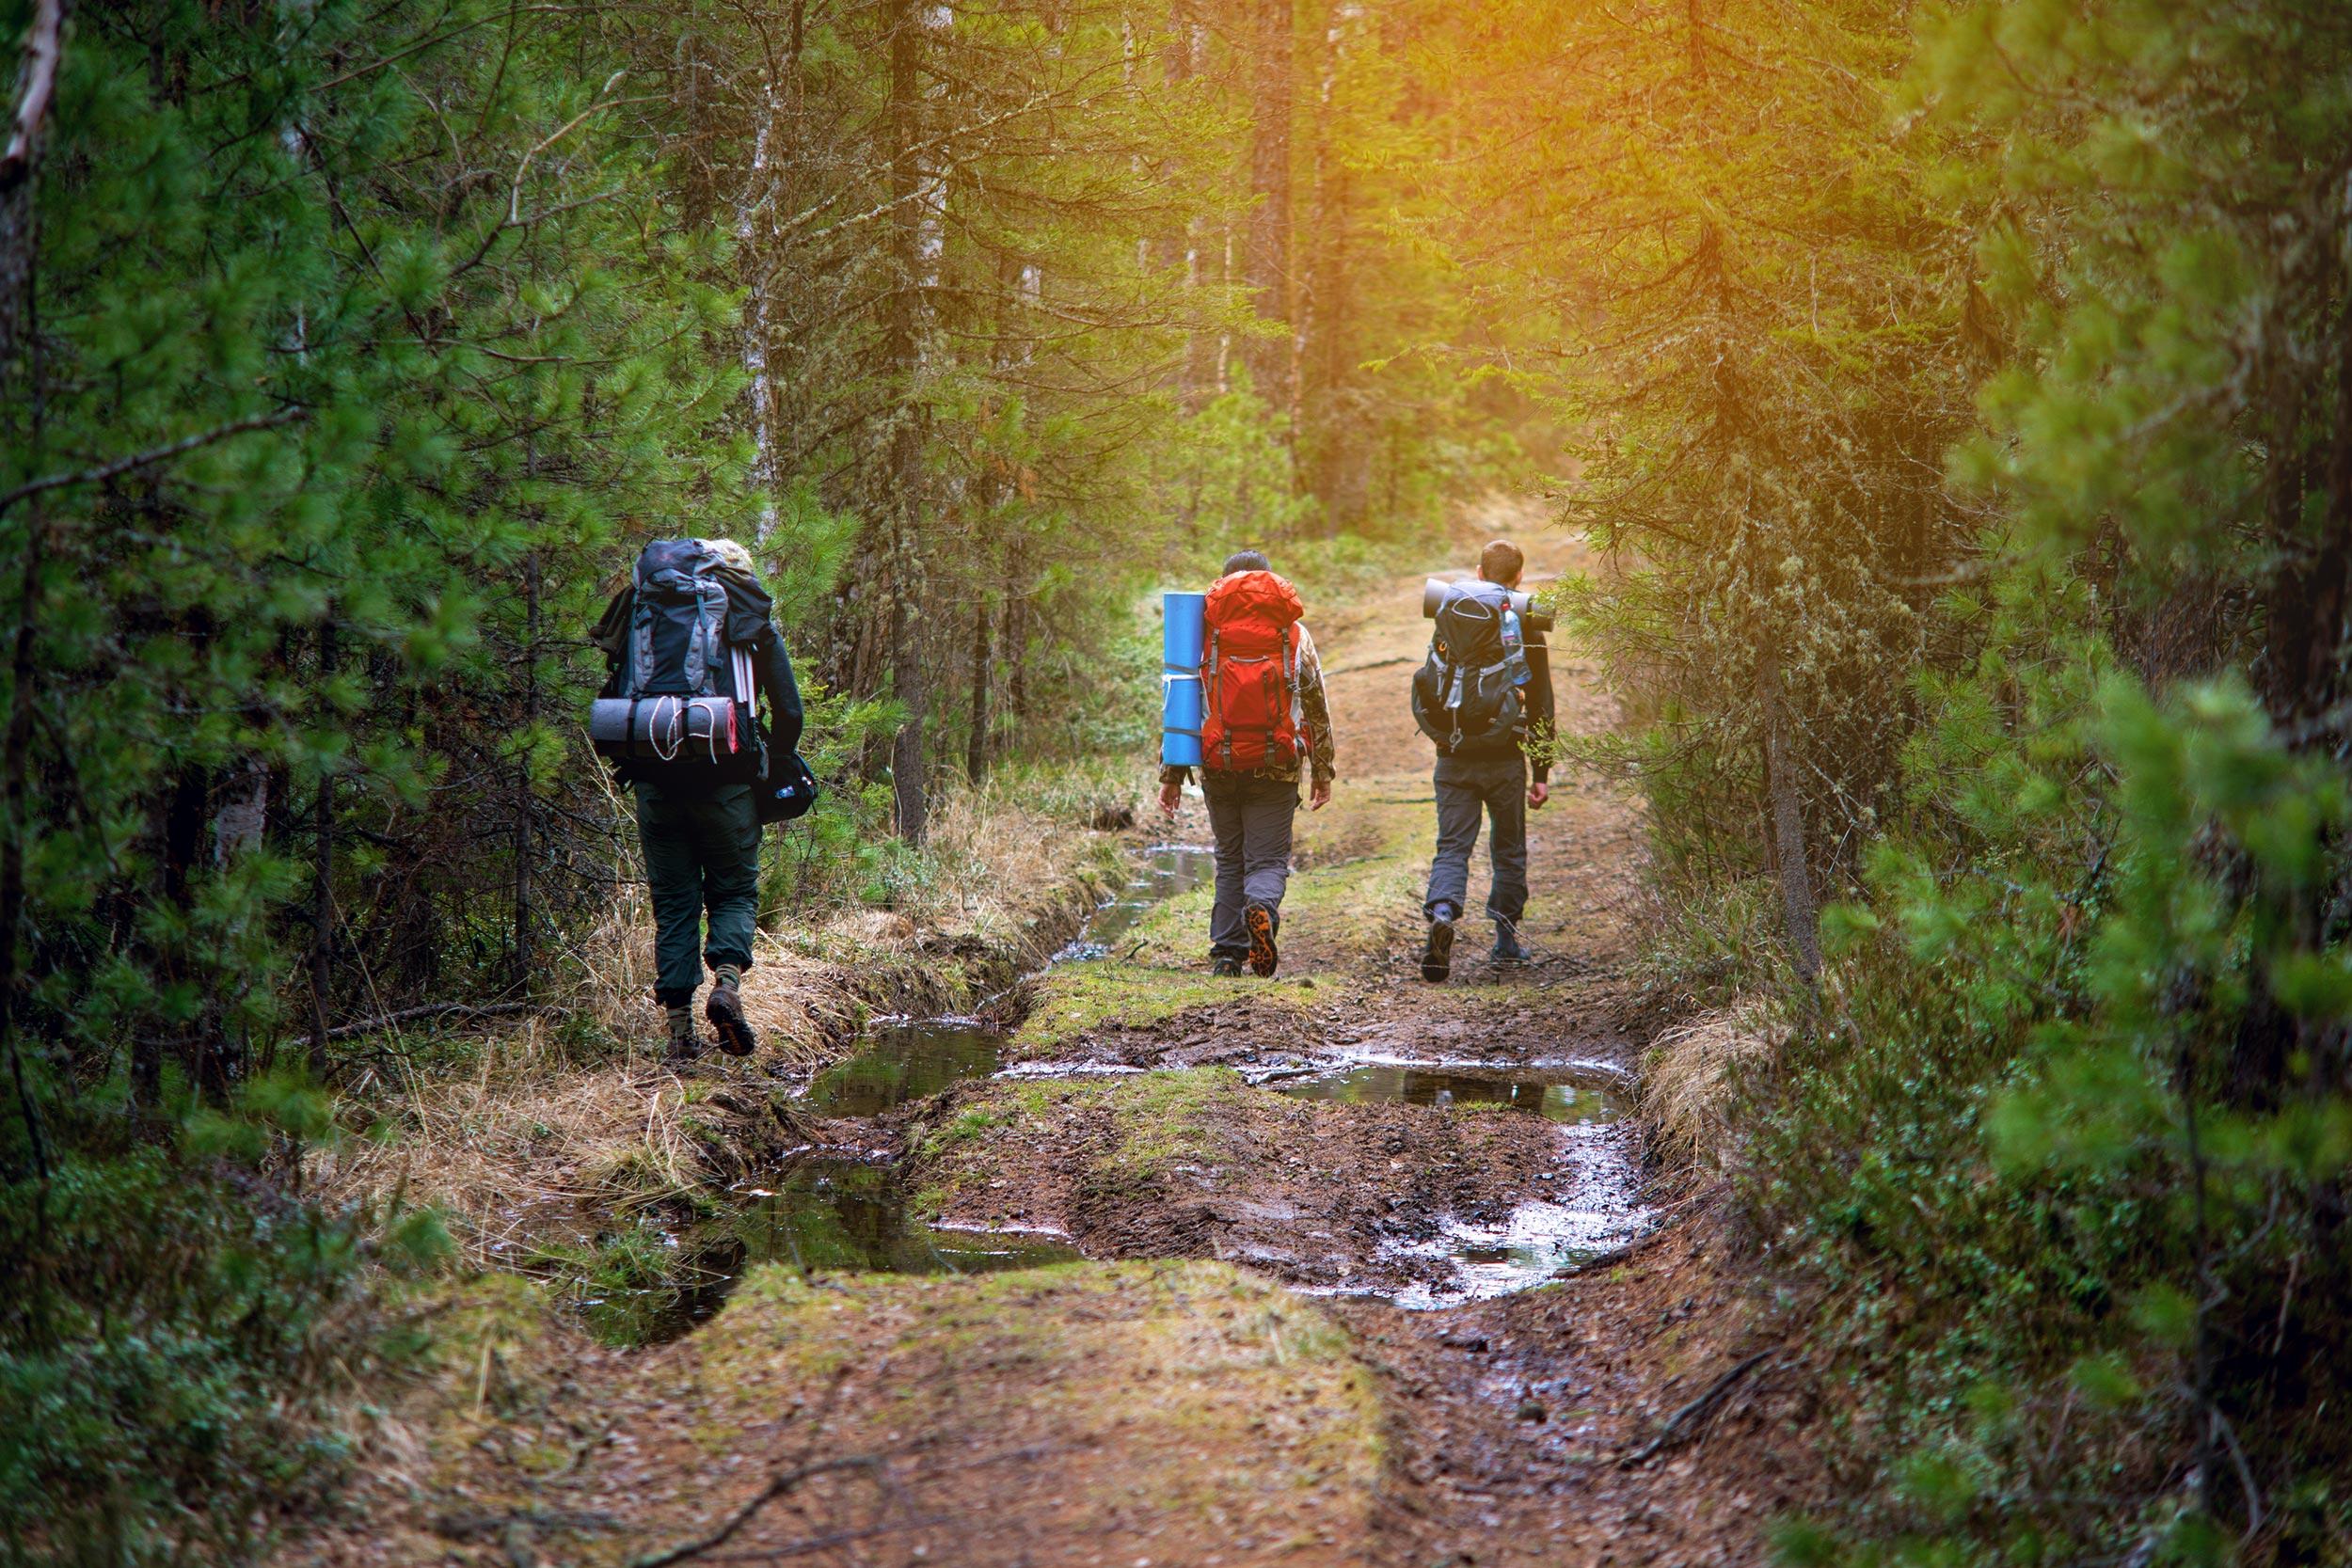 Obitelj planinari šumom